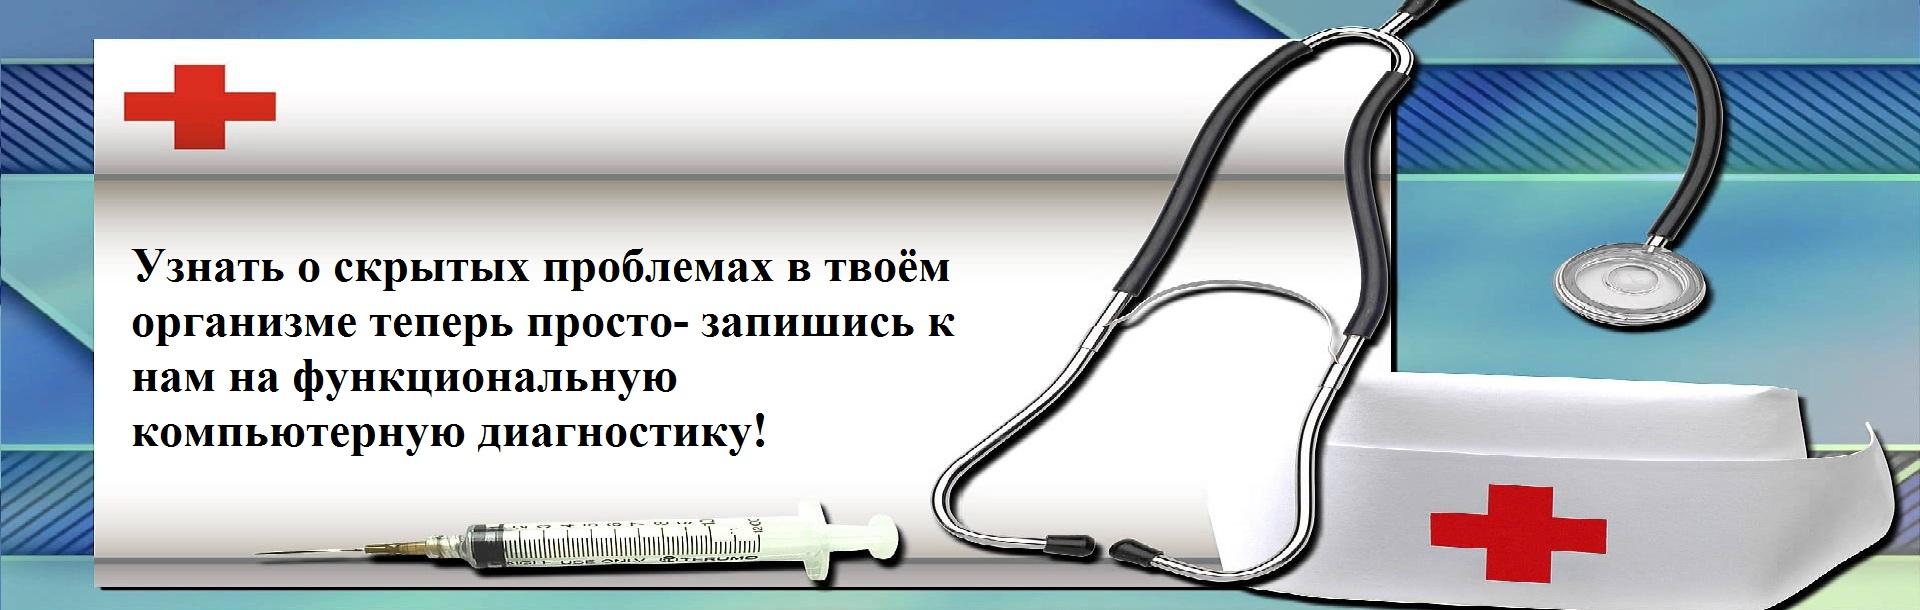 Диагностика1